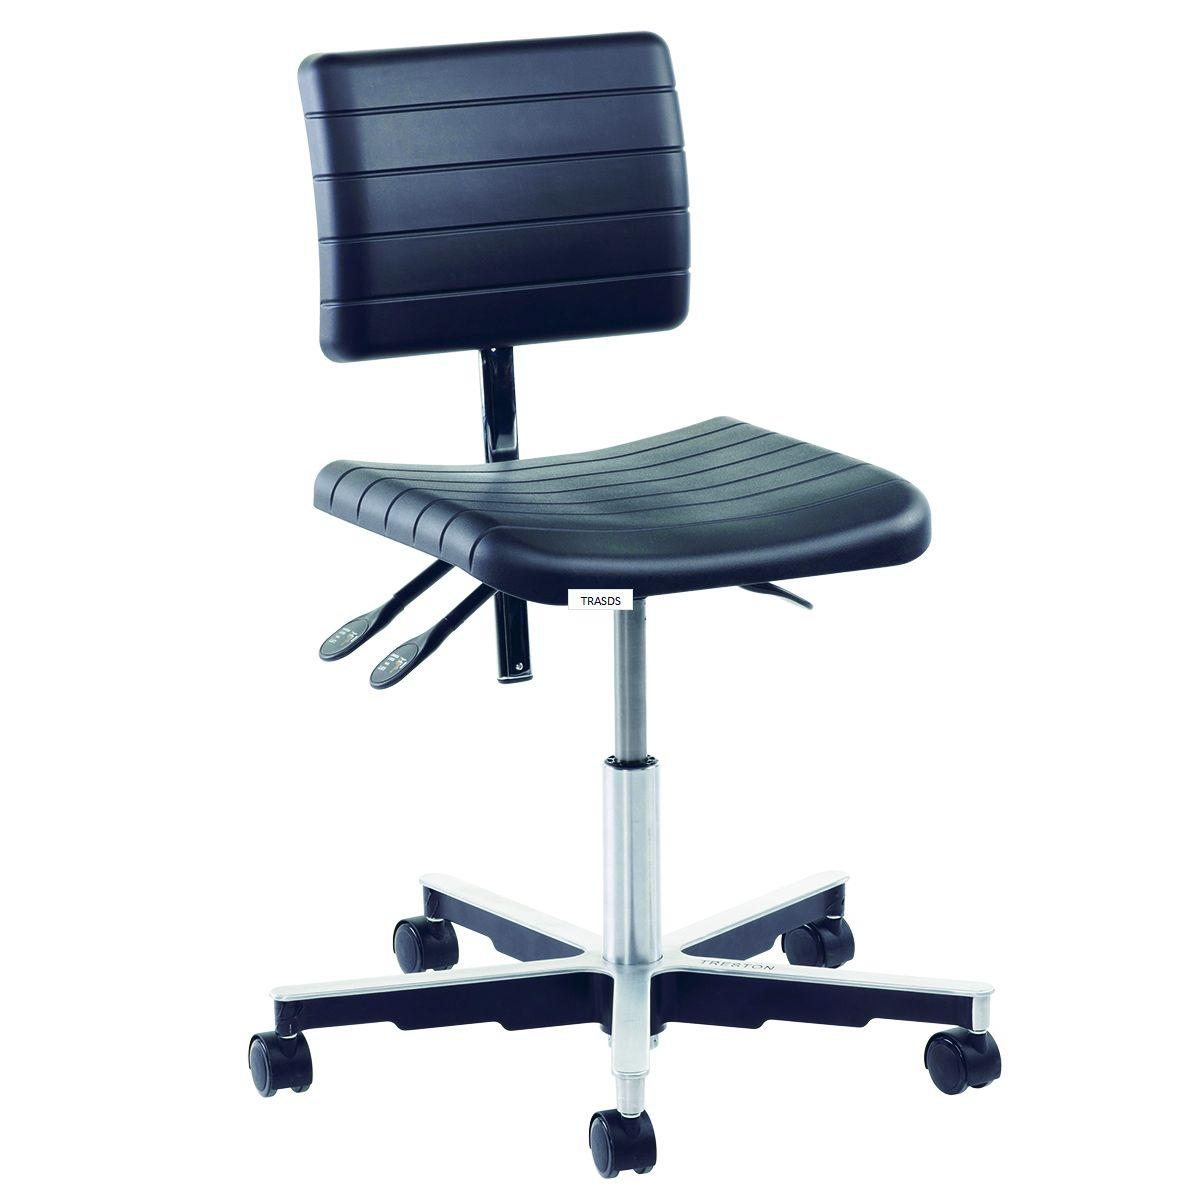 Anti Static Chairs : Anti static pu draughtsman chairs stool workshop